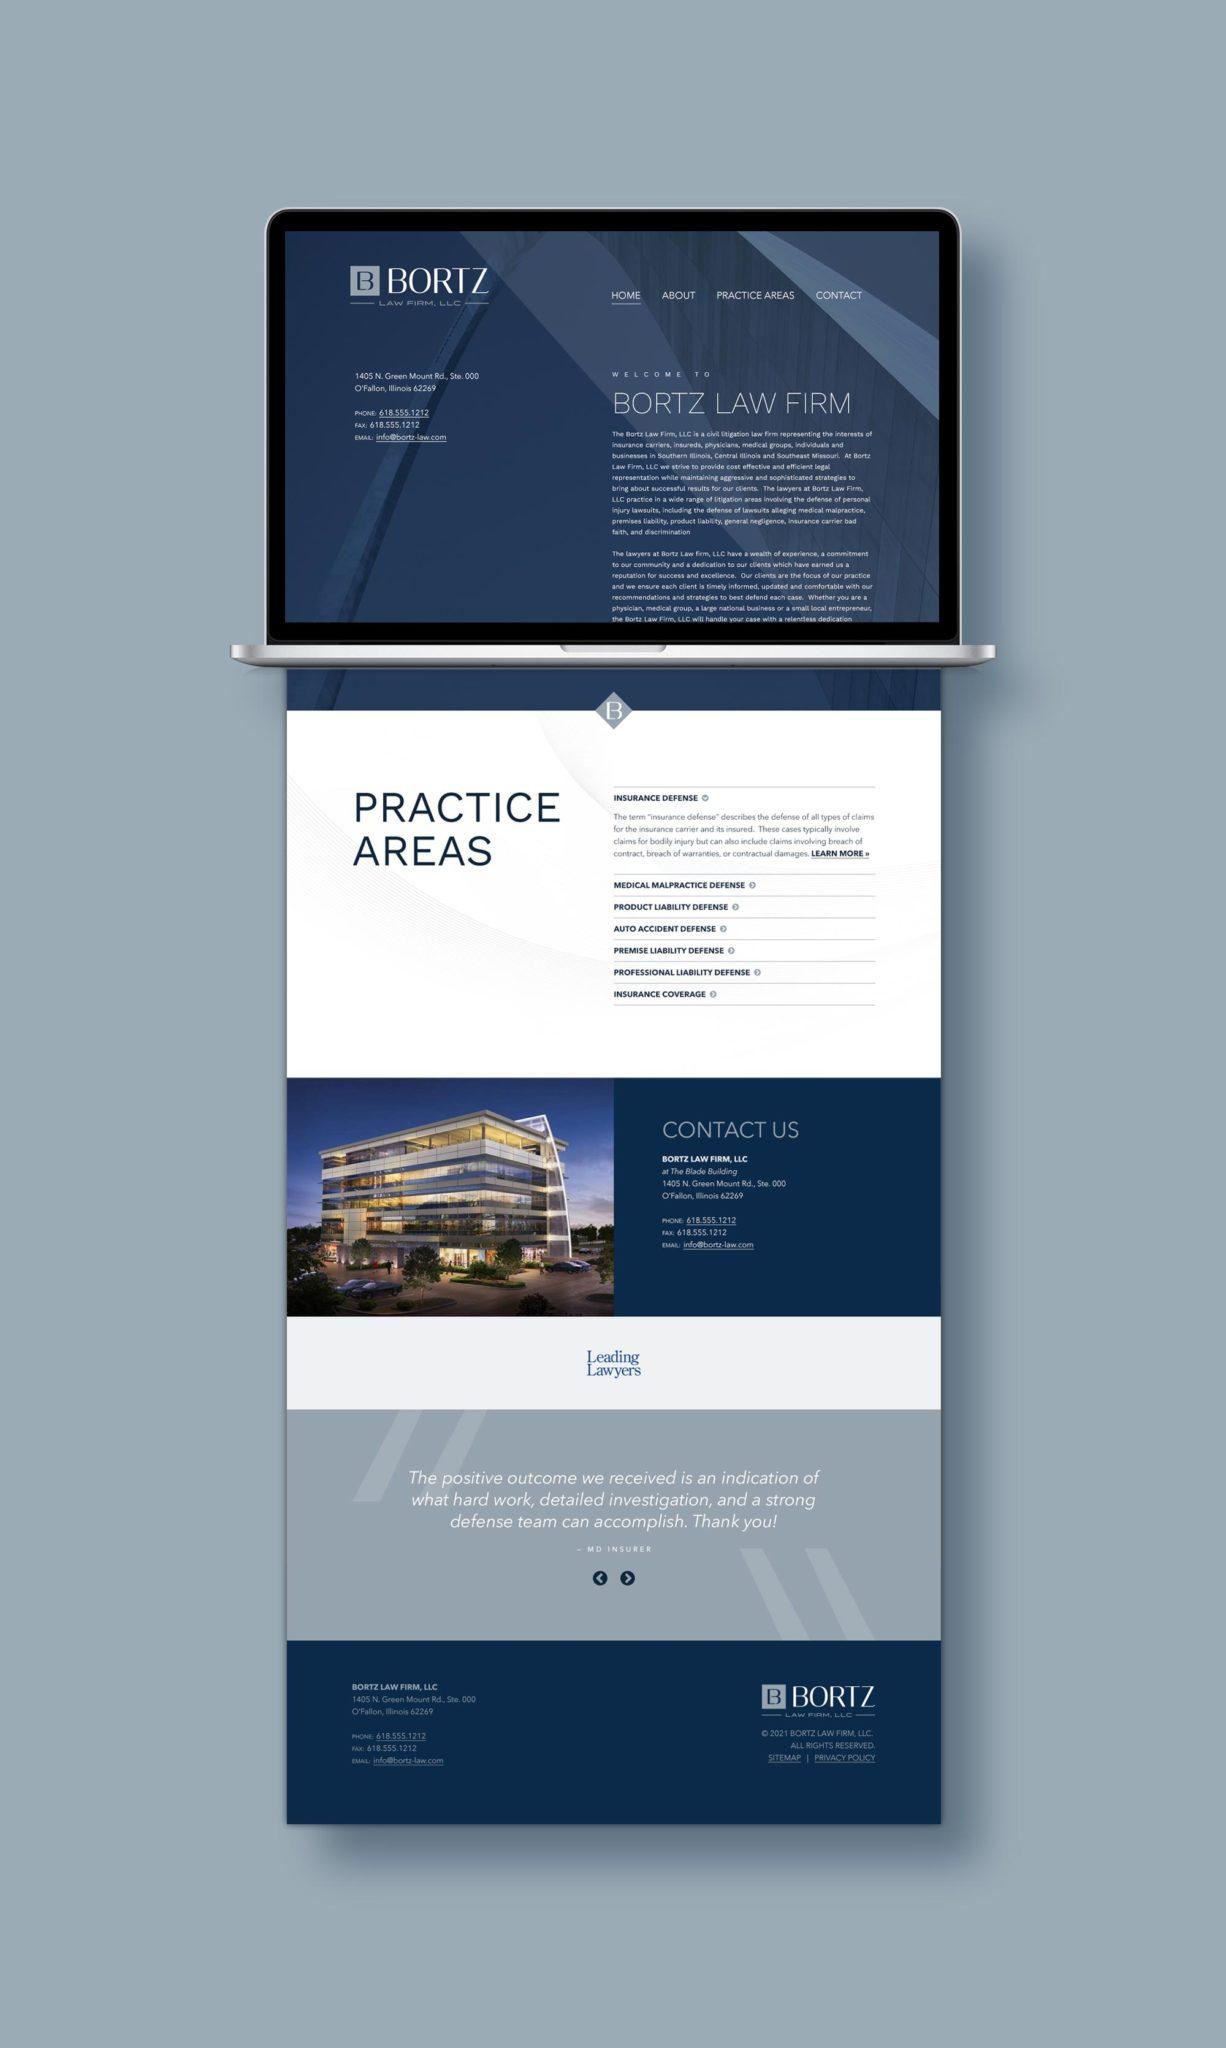 bortz-website-design